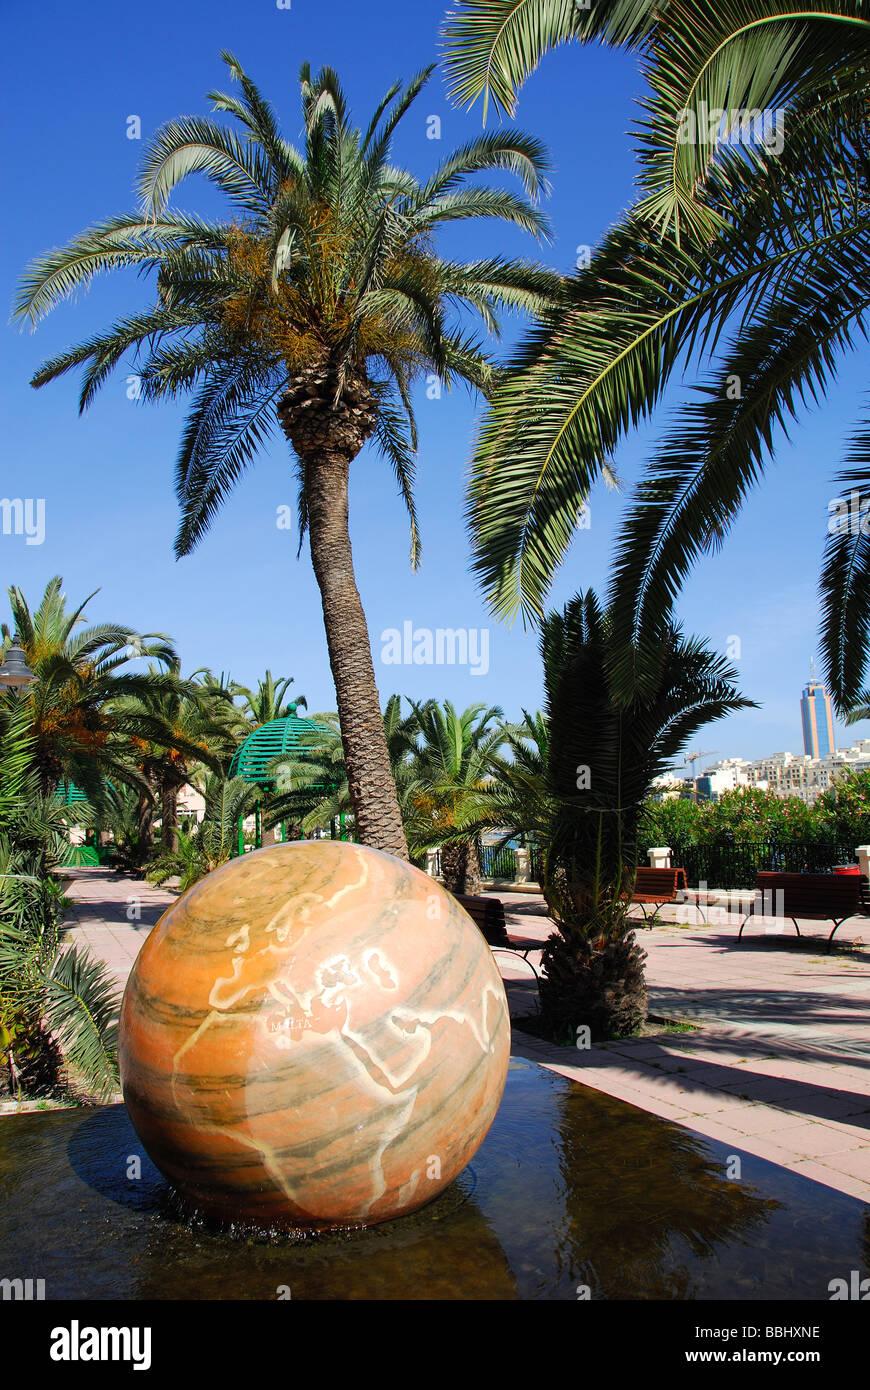 MALTA. Revolving marble globe in Independence Gardens on Triq it-Torri between Sliema and St. Julian's. - Stock Image